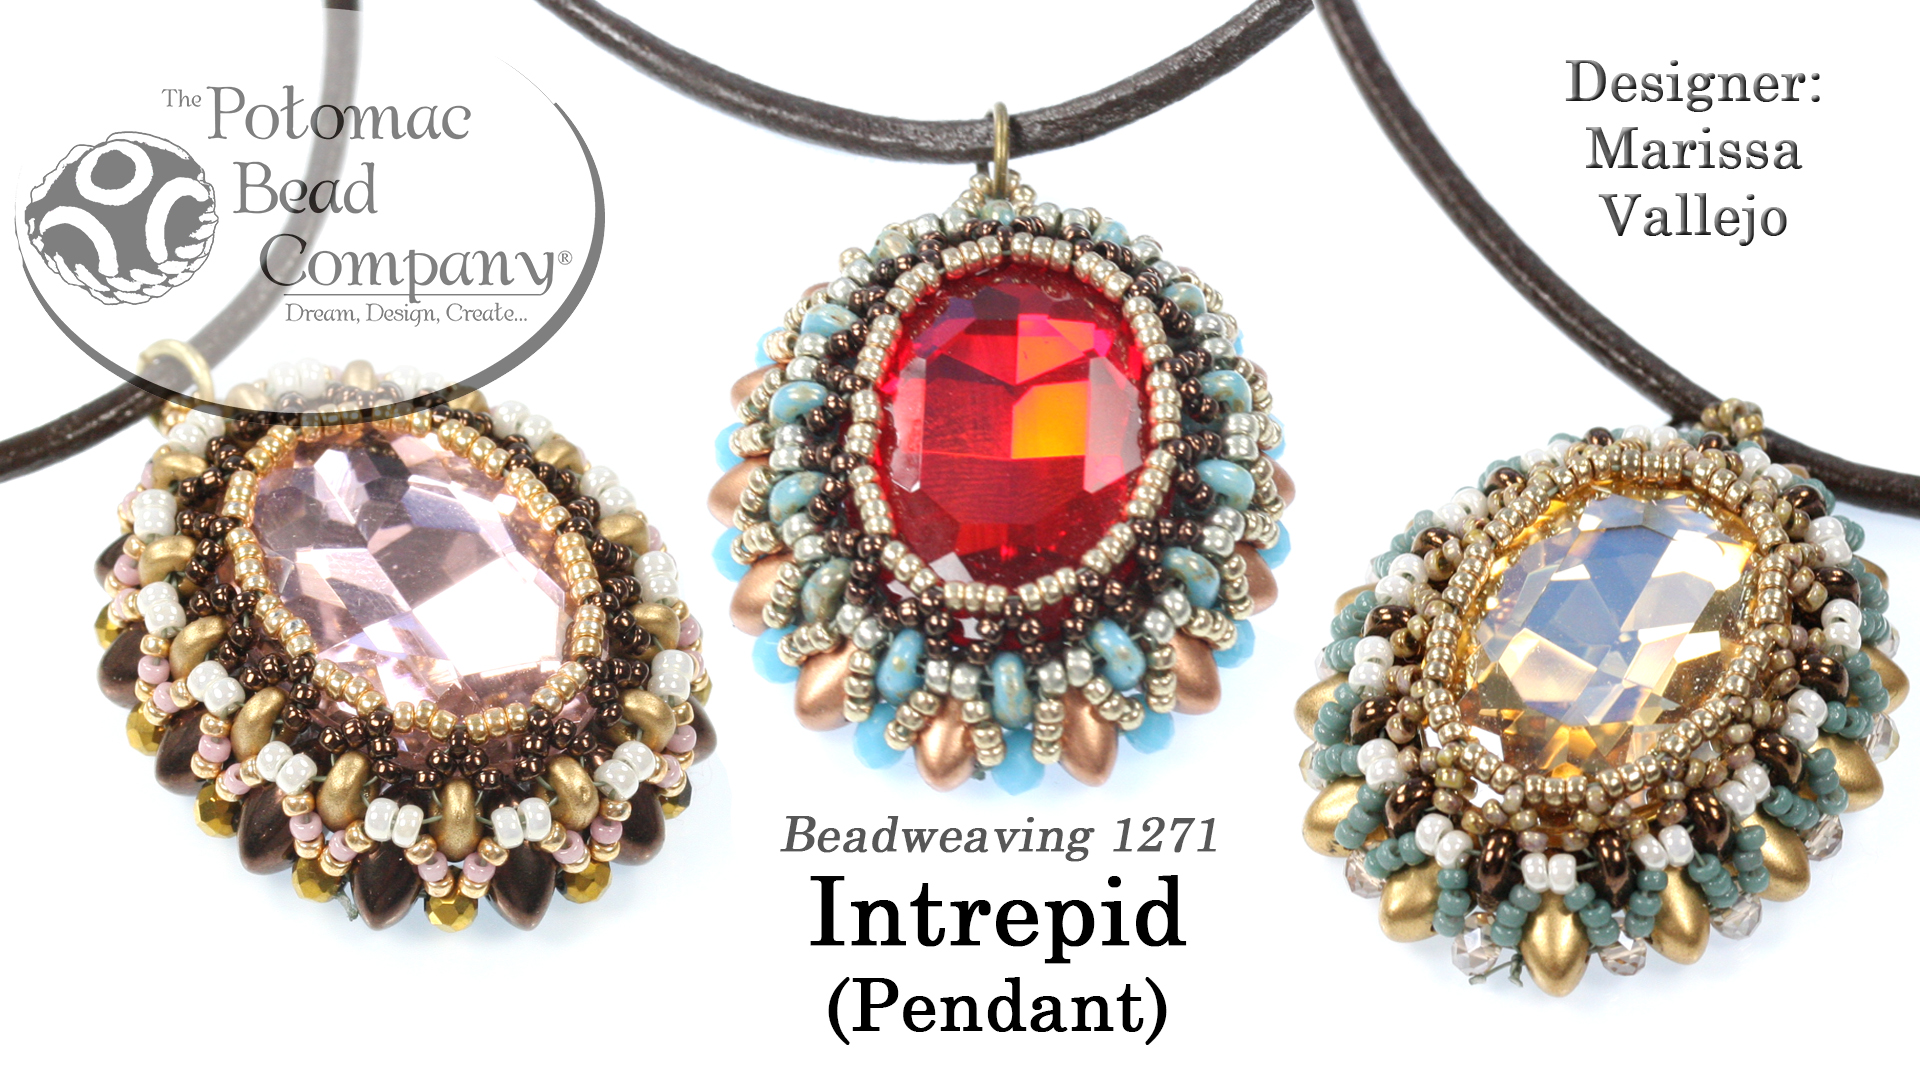 How to Bead / Videos Sorted by Beads / IrisDuo® Bead Videos / Intrepid Pendant Tutorial